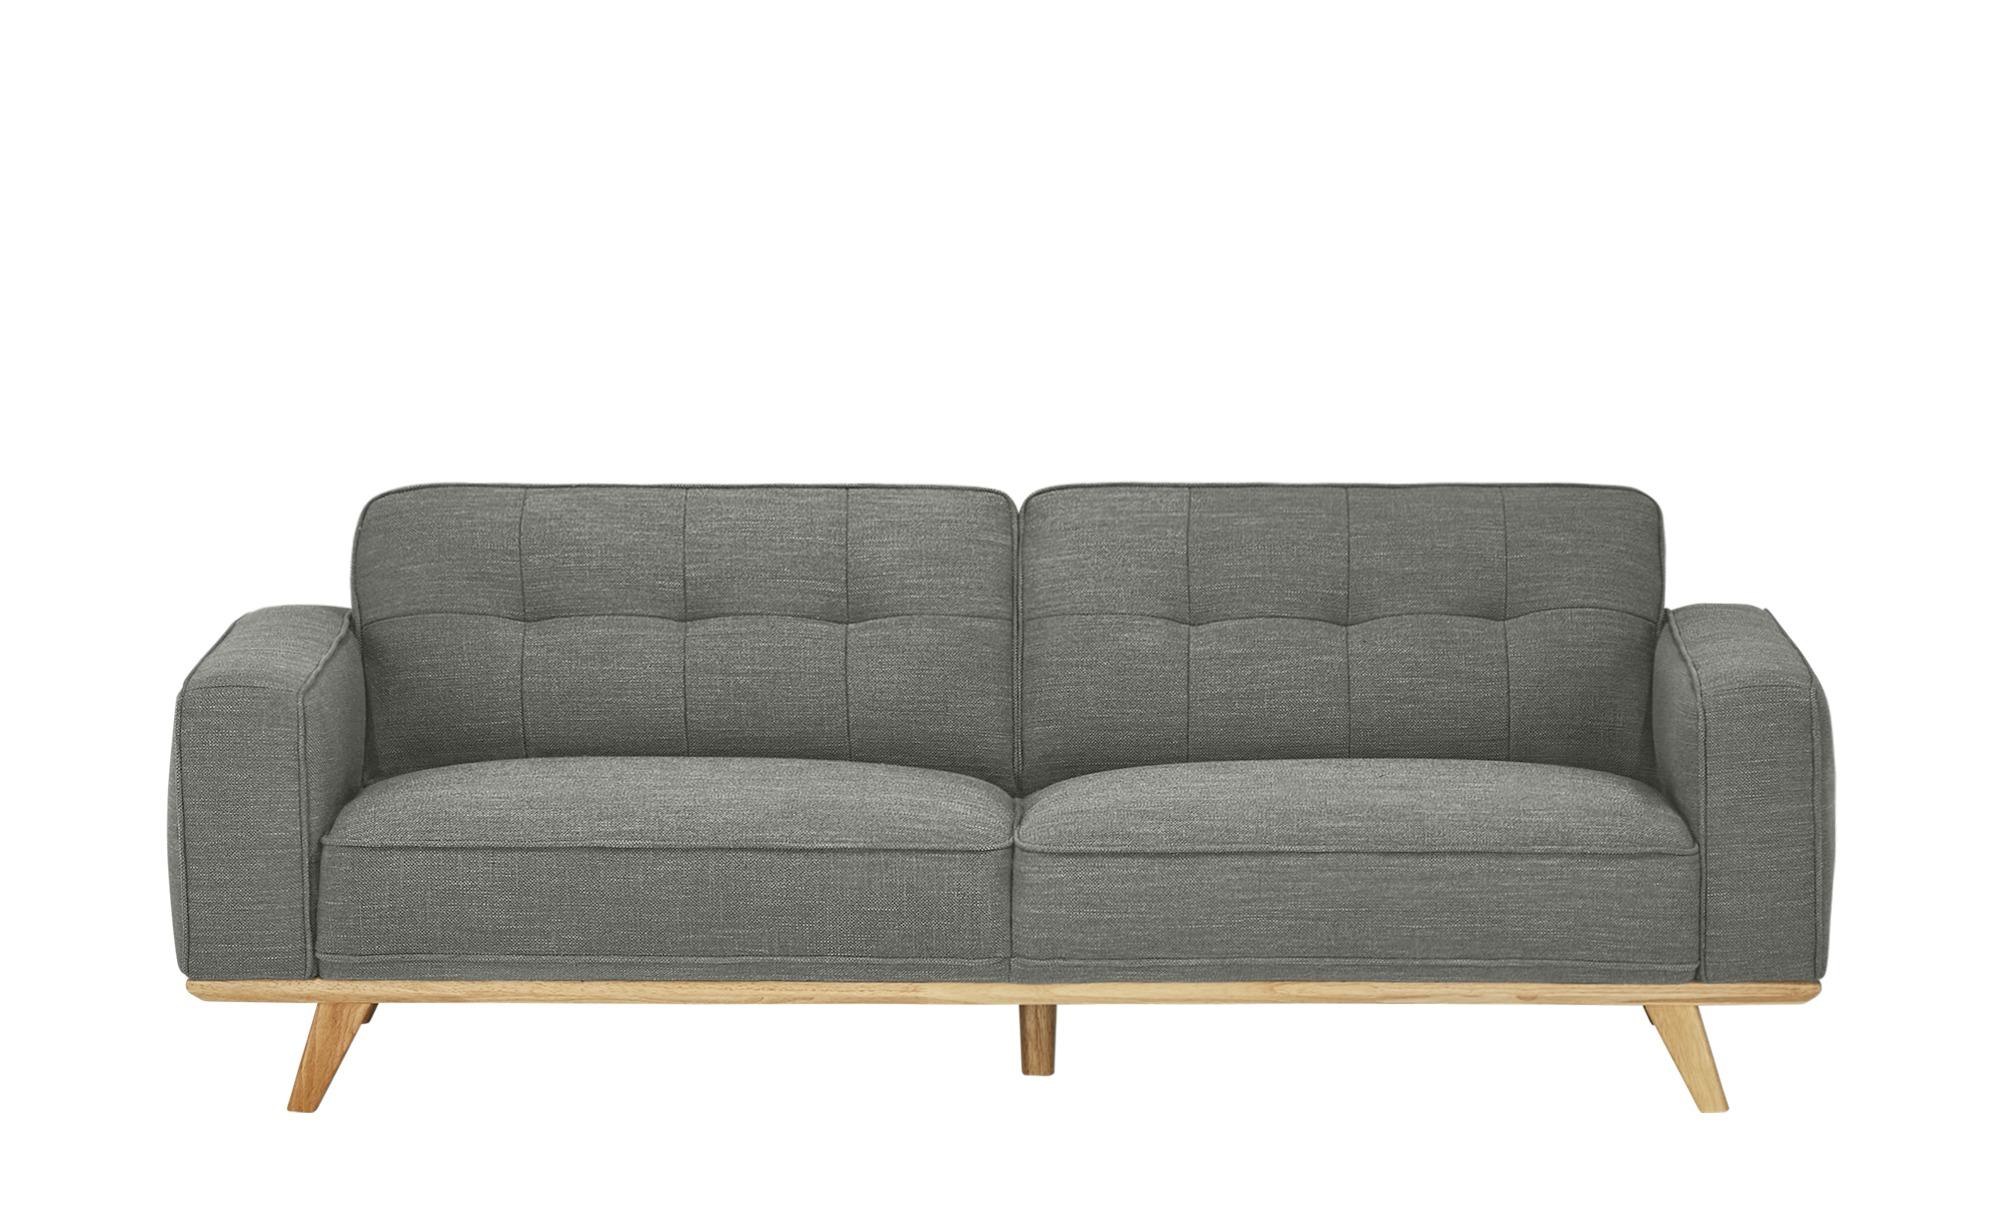 uno Sofa, 3-sitzig  Caralina ¦ grau ¦ Maße (cm): B: 227 H: 78 T: 95 Polstermöbel > Sofas > 3-Sitzer - Höffner